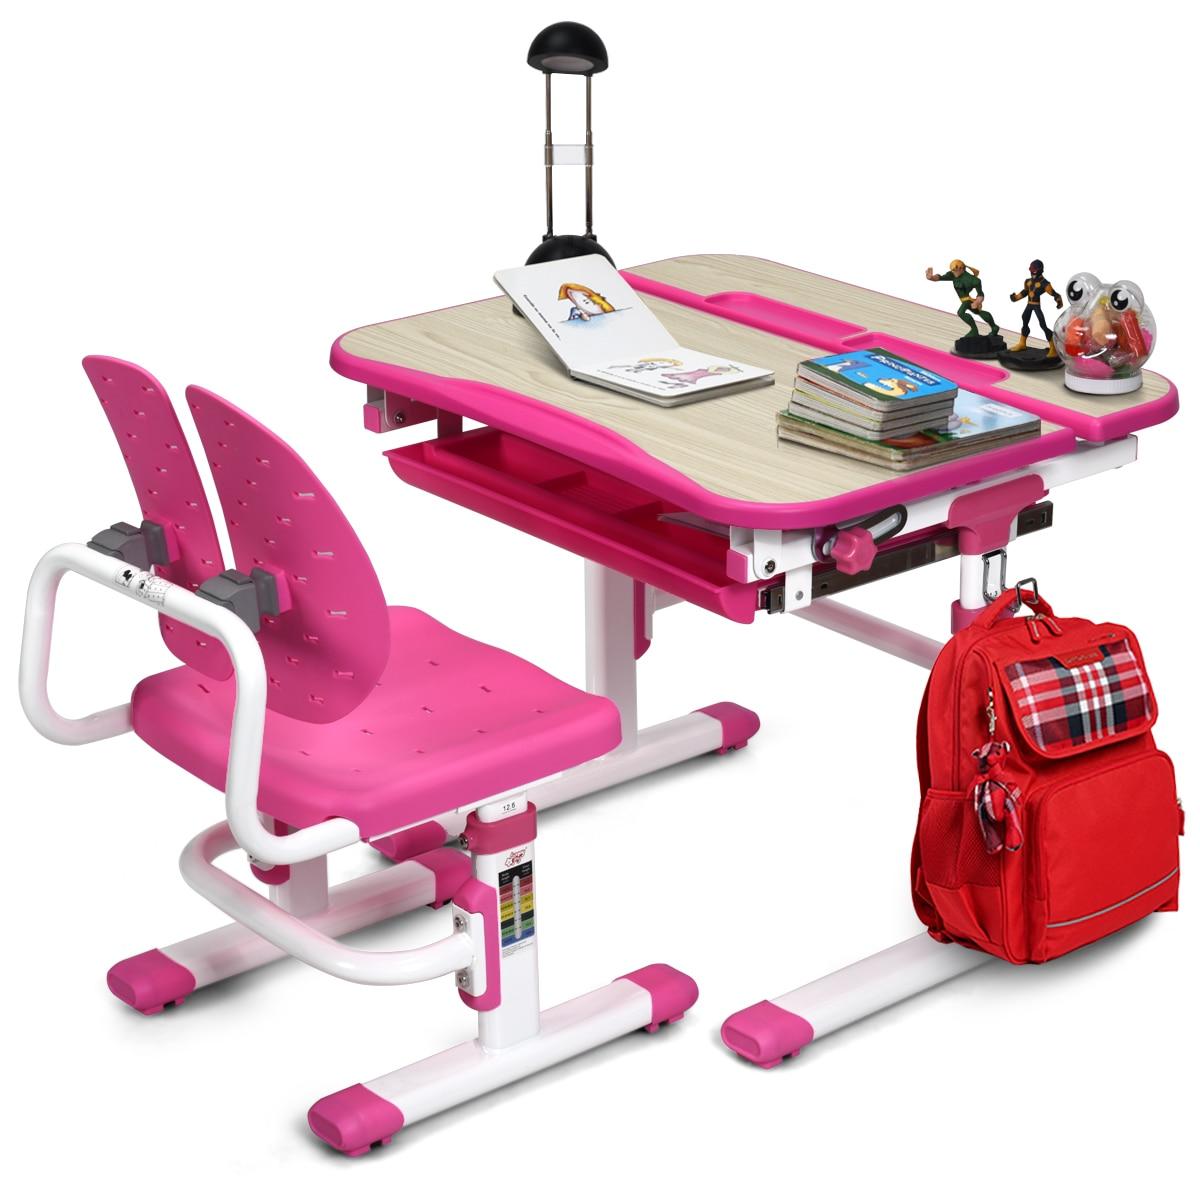 Children Desk Chair Set Adjustable Study Table W/ Drawer & Winged Backrest Chair